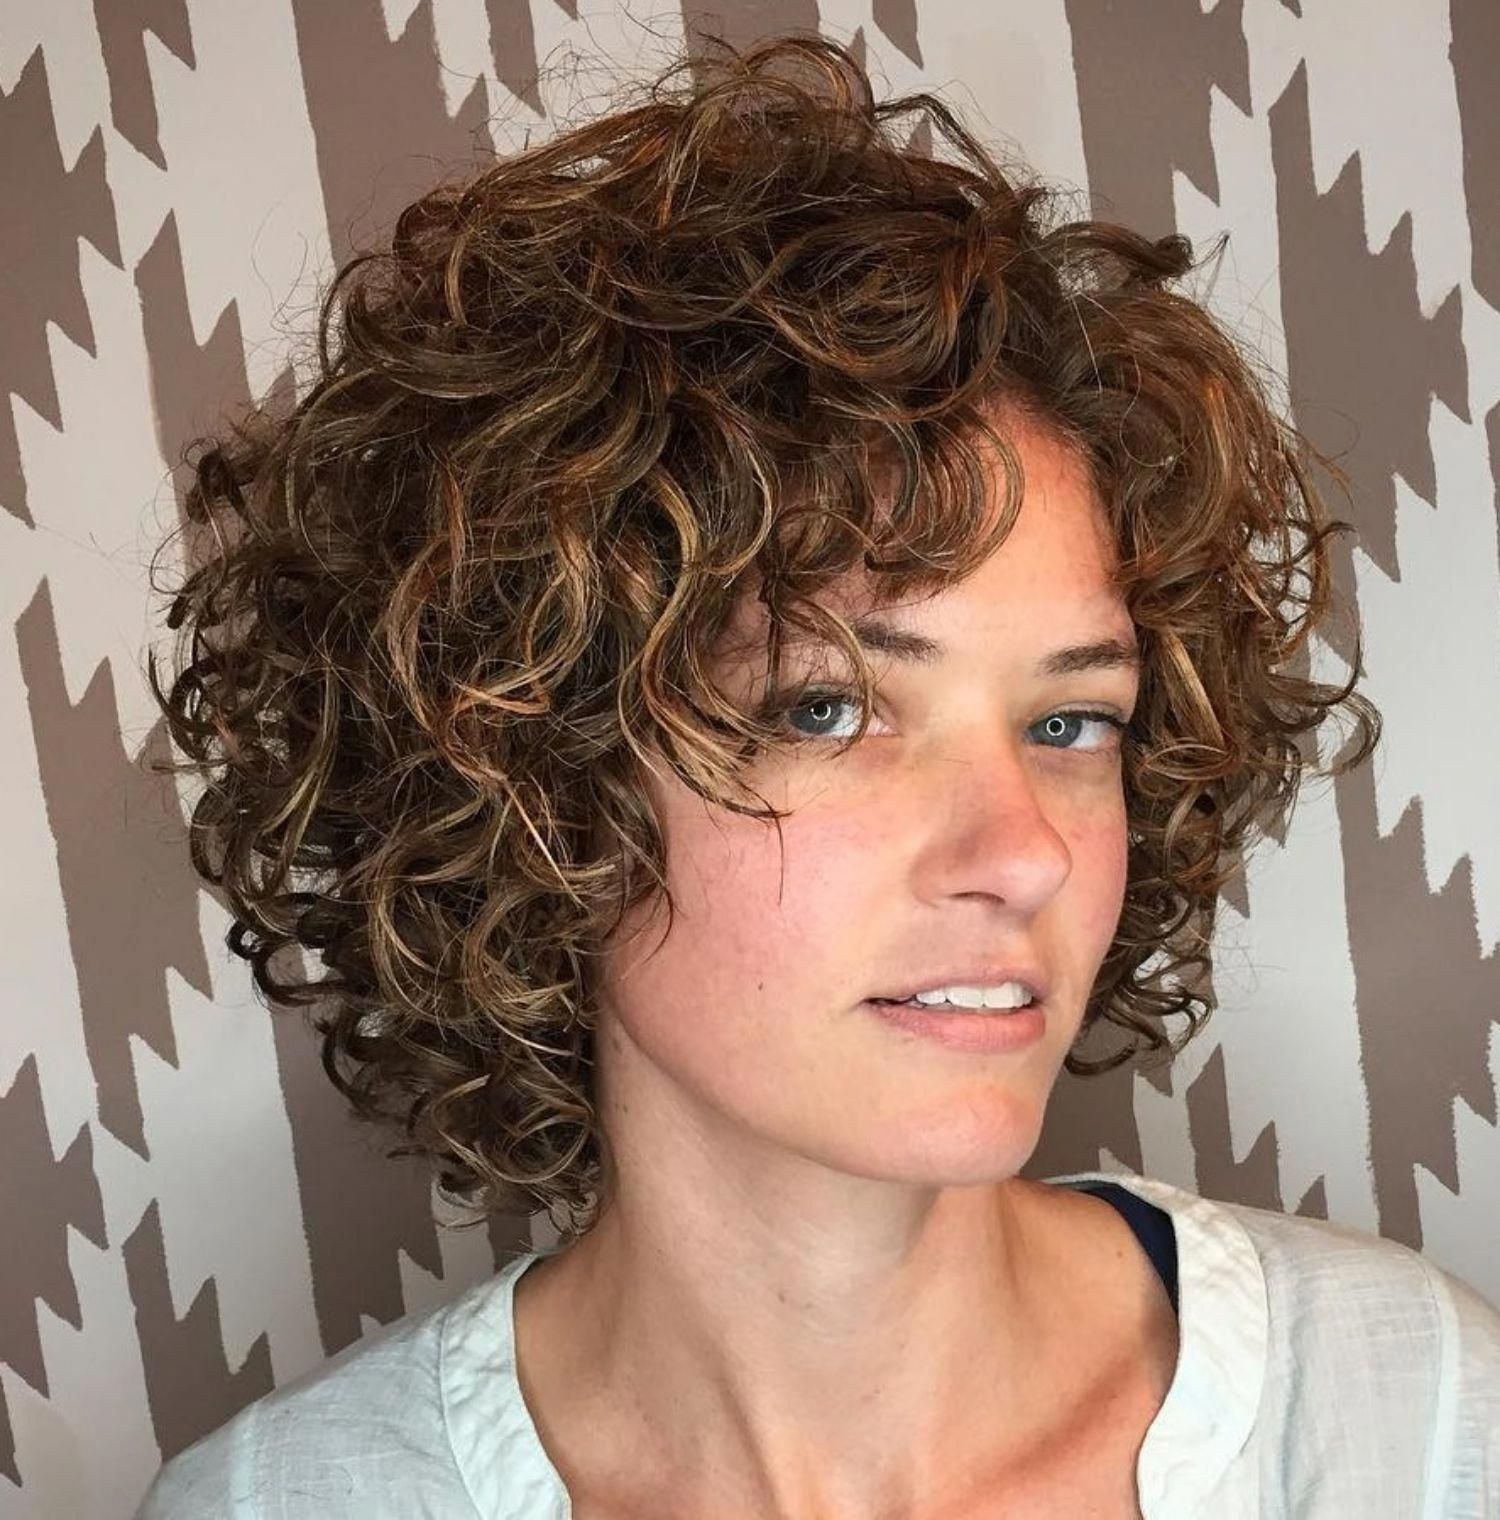 Well-Shaped Chin-Length Curly Bob #shortcurlyhair in 2020 | Curly hair  styles, Curly hair photos, Hair styles